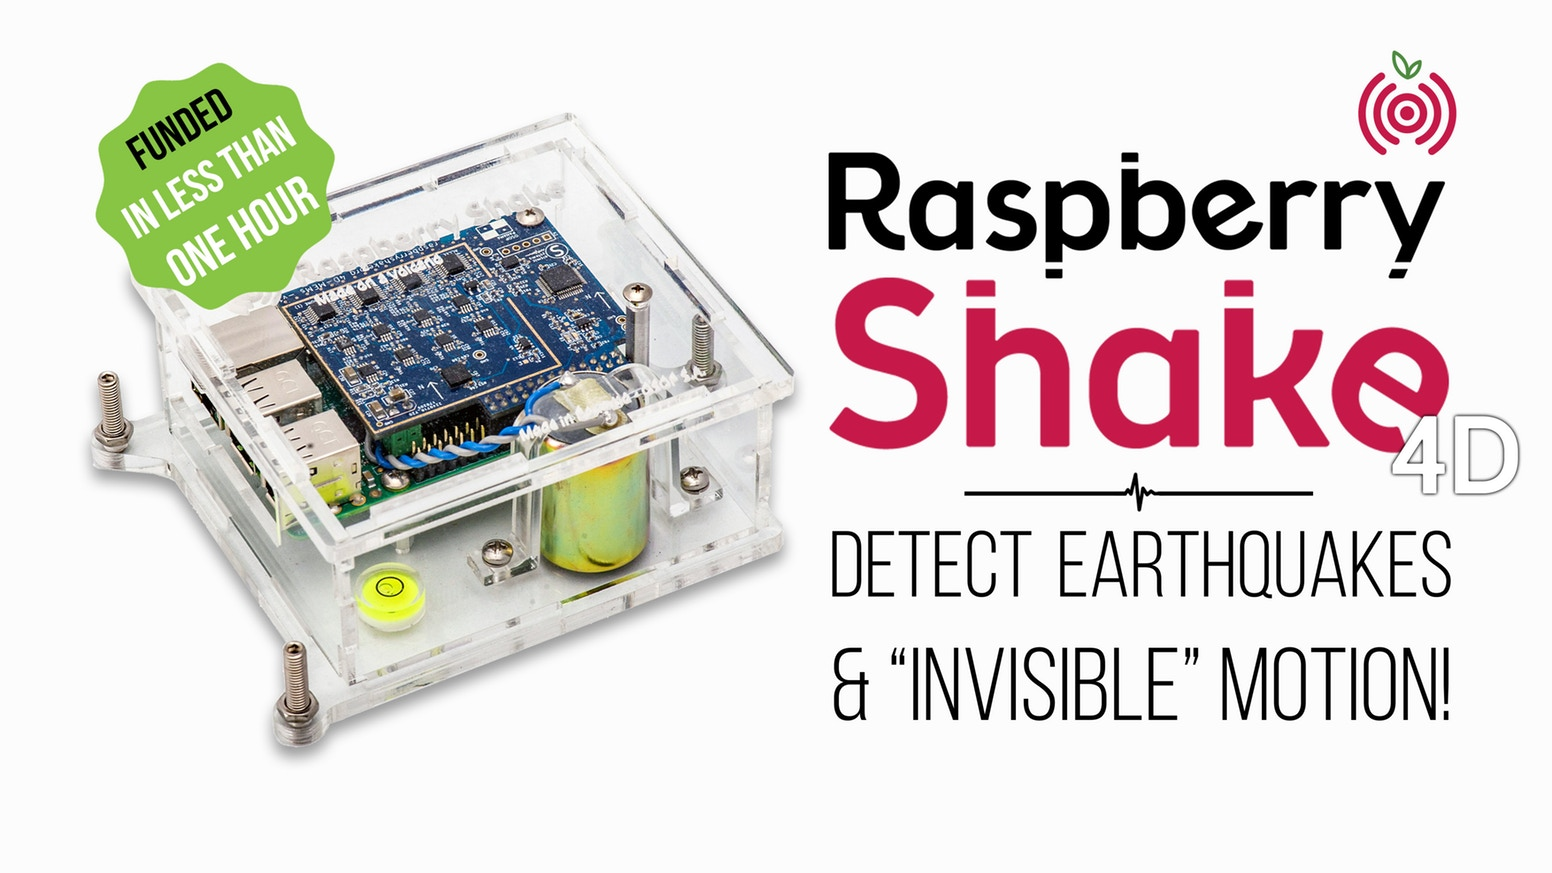 Raspberry Shake 4D Campaign